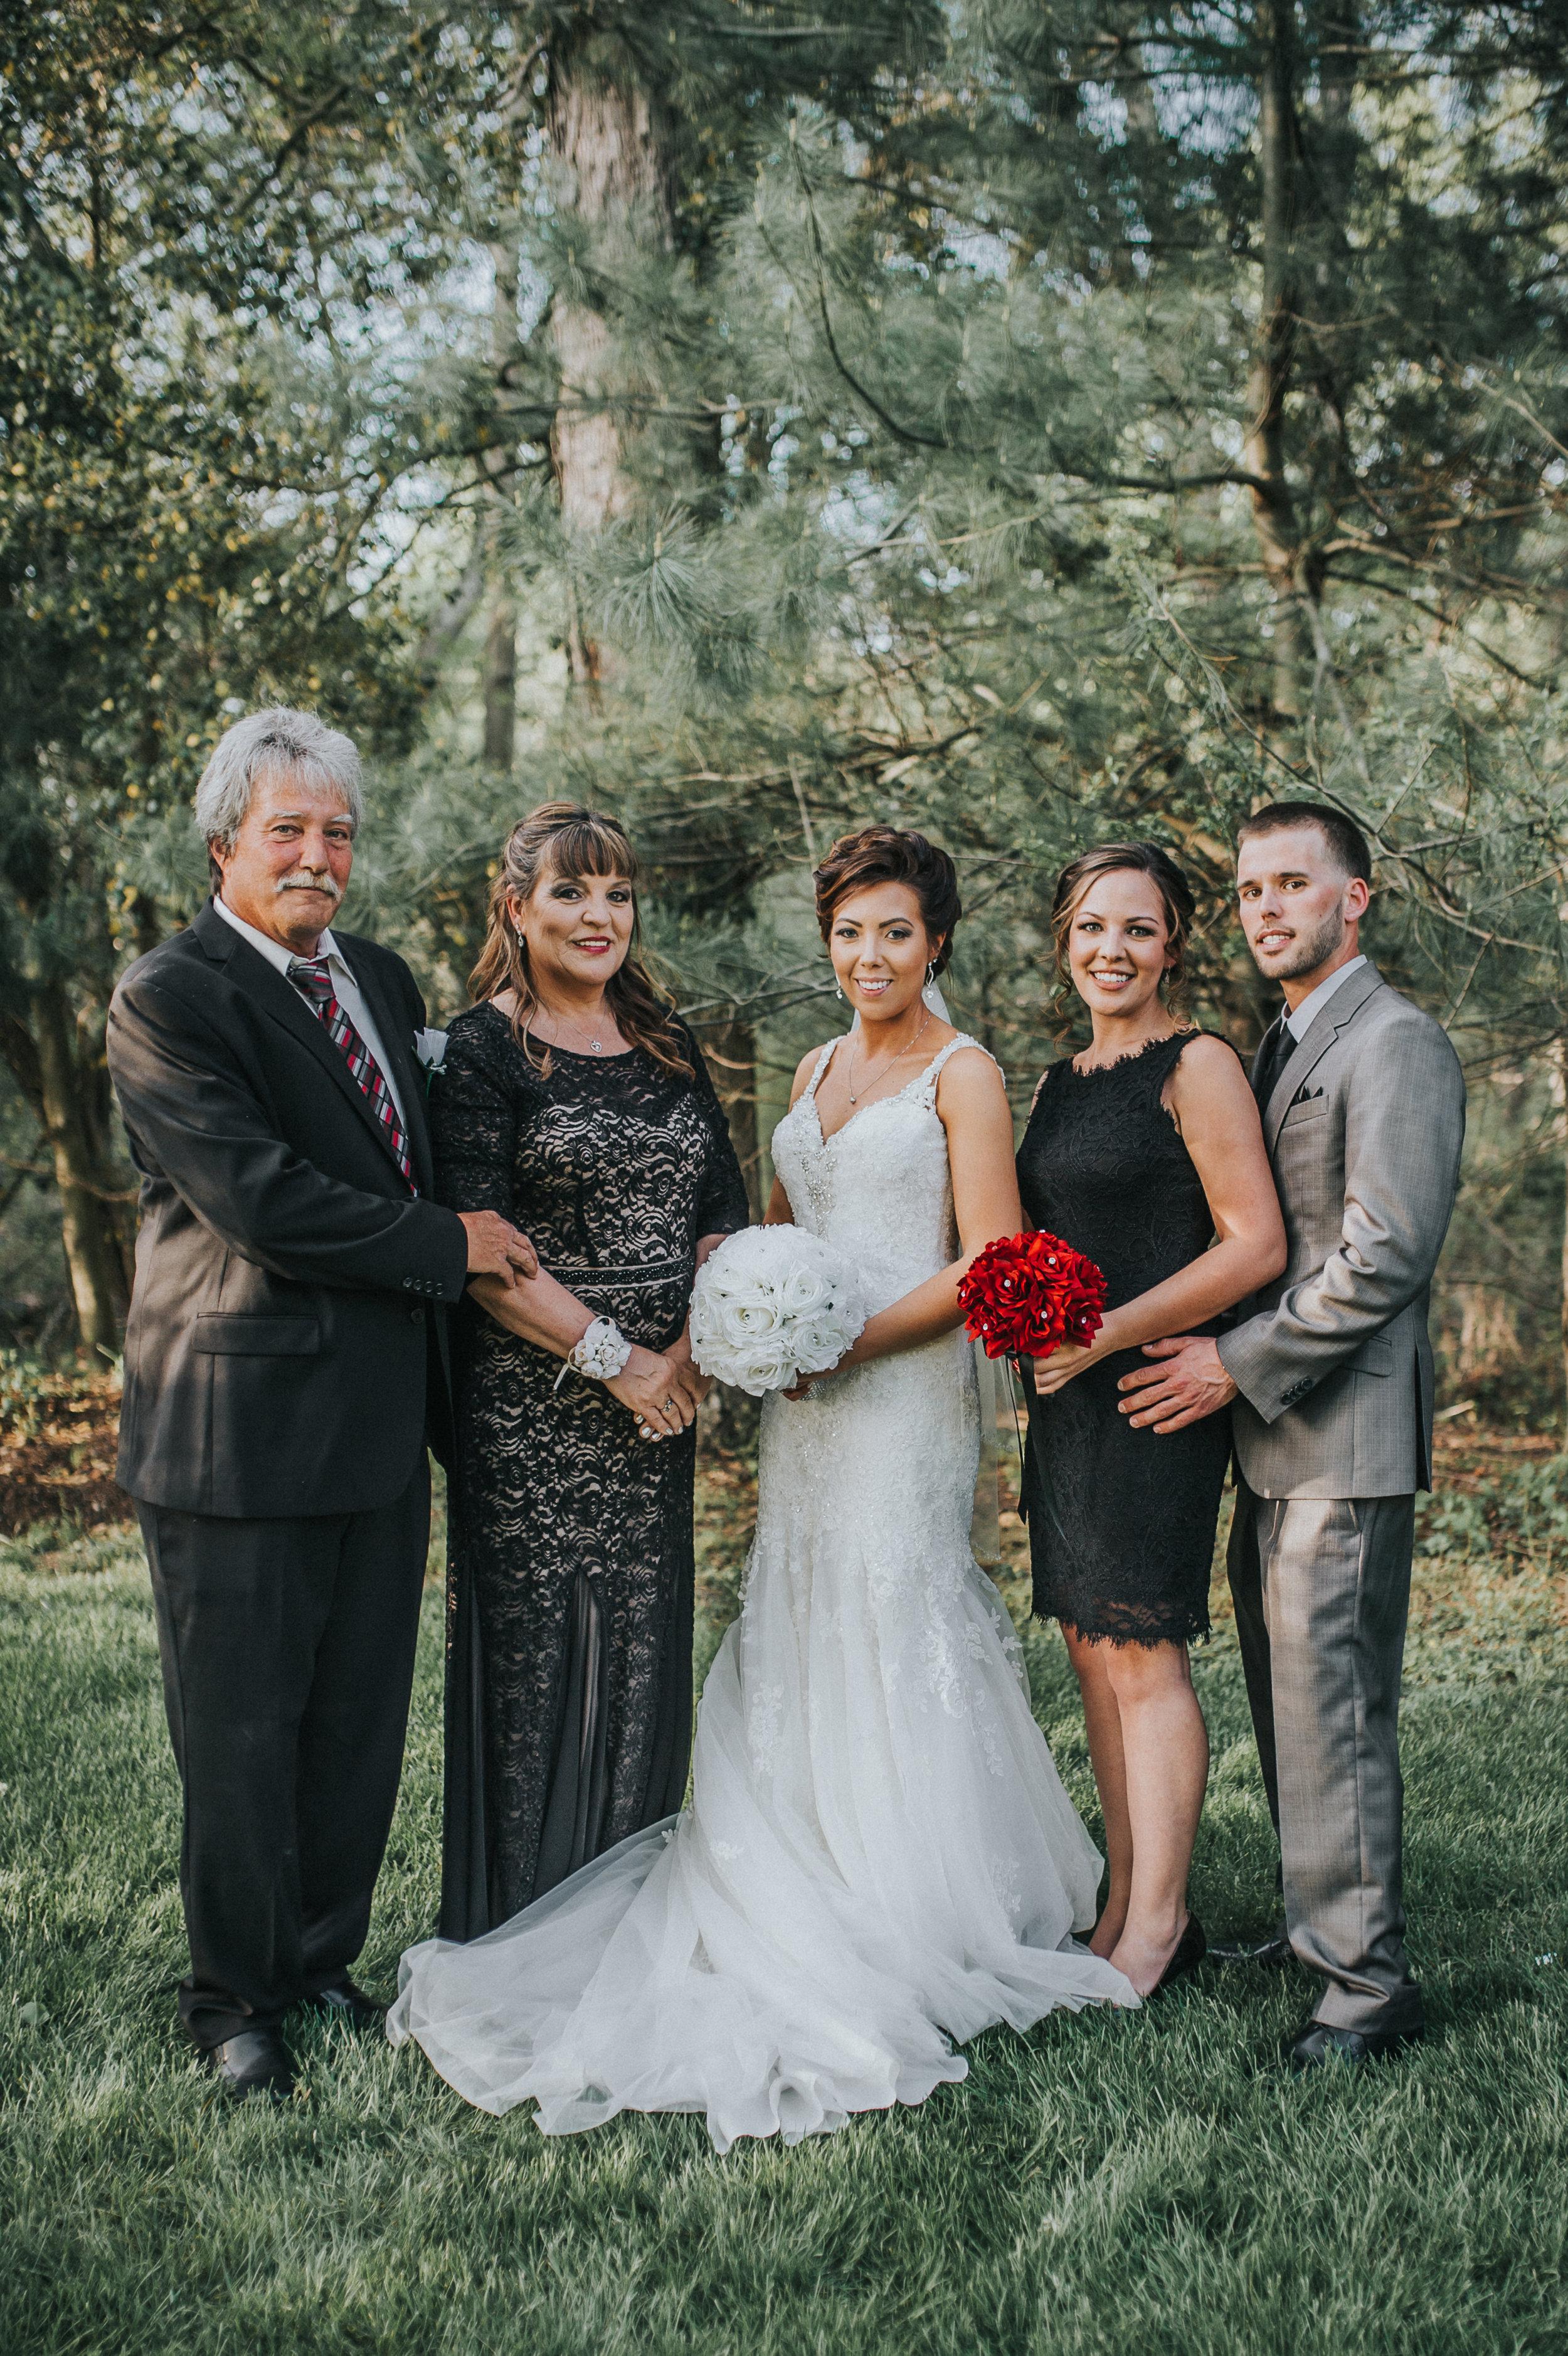 Christina-and-Gene-Wedding-Marla-Rain-Photography-398.jpg